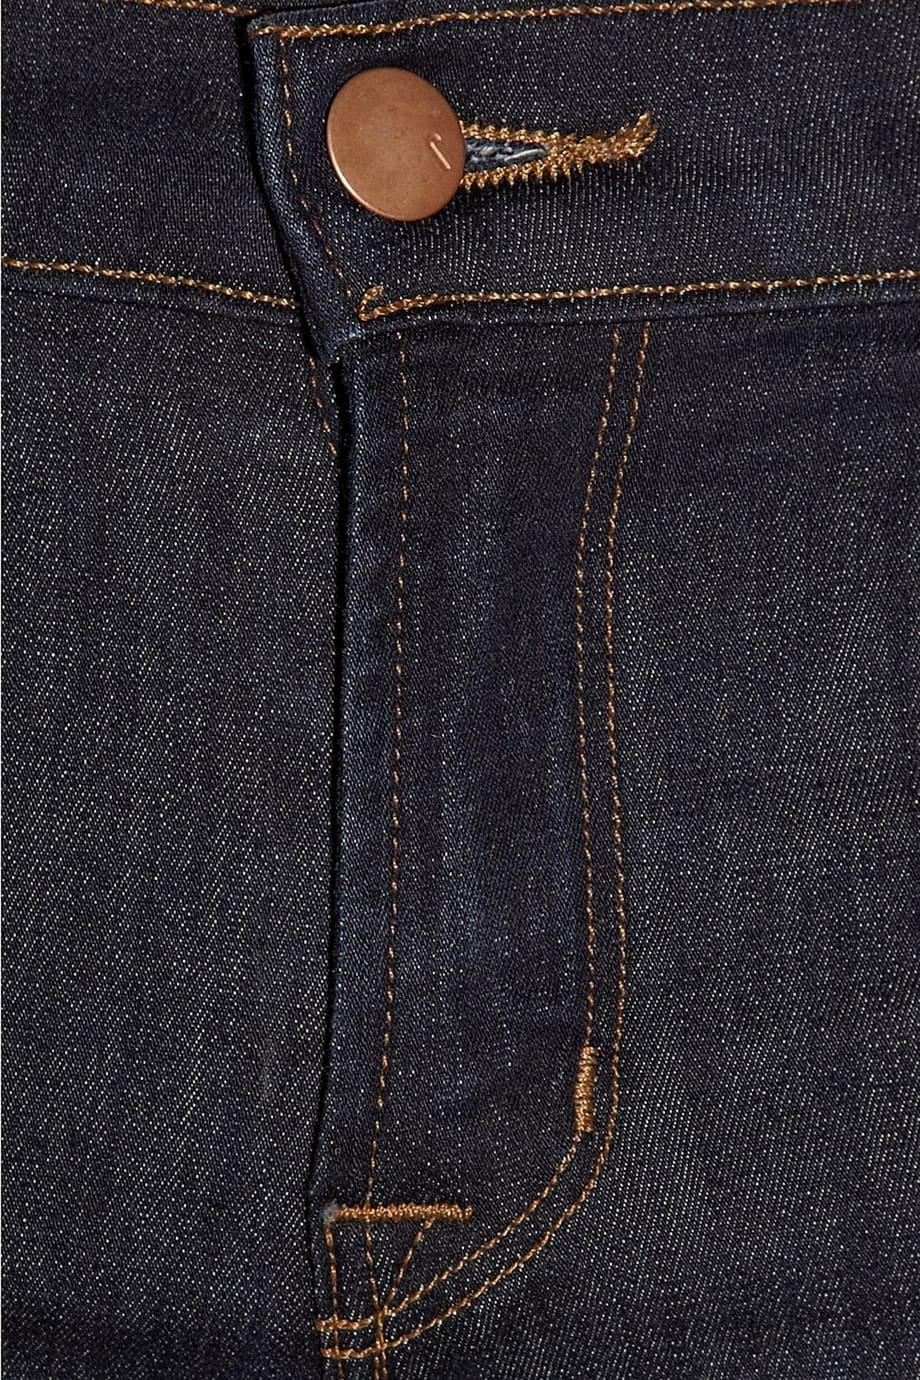 image Arborer le look de (Black Widow) Natasha Romanoff en jeans J Brand 20